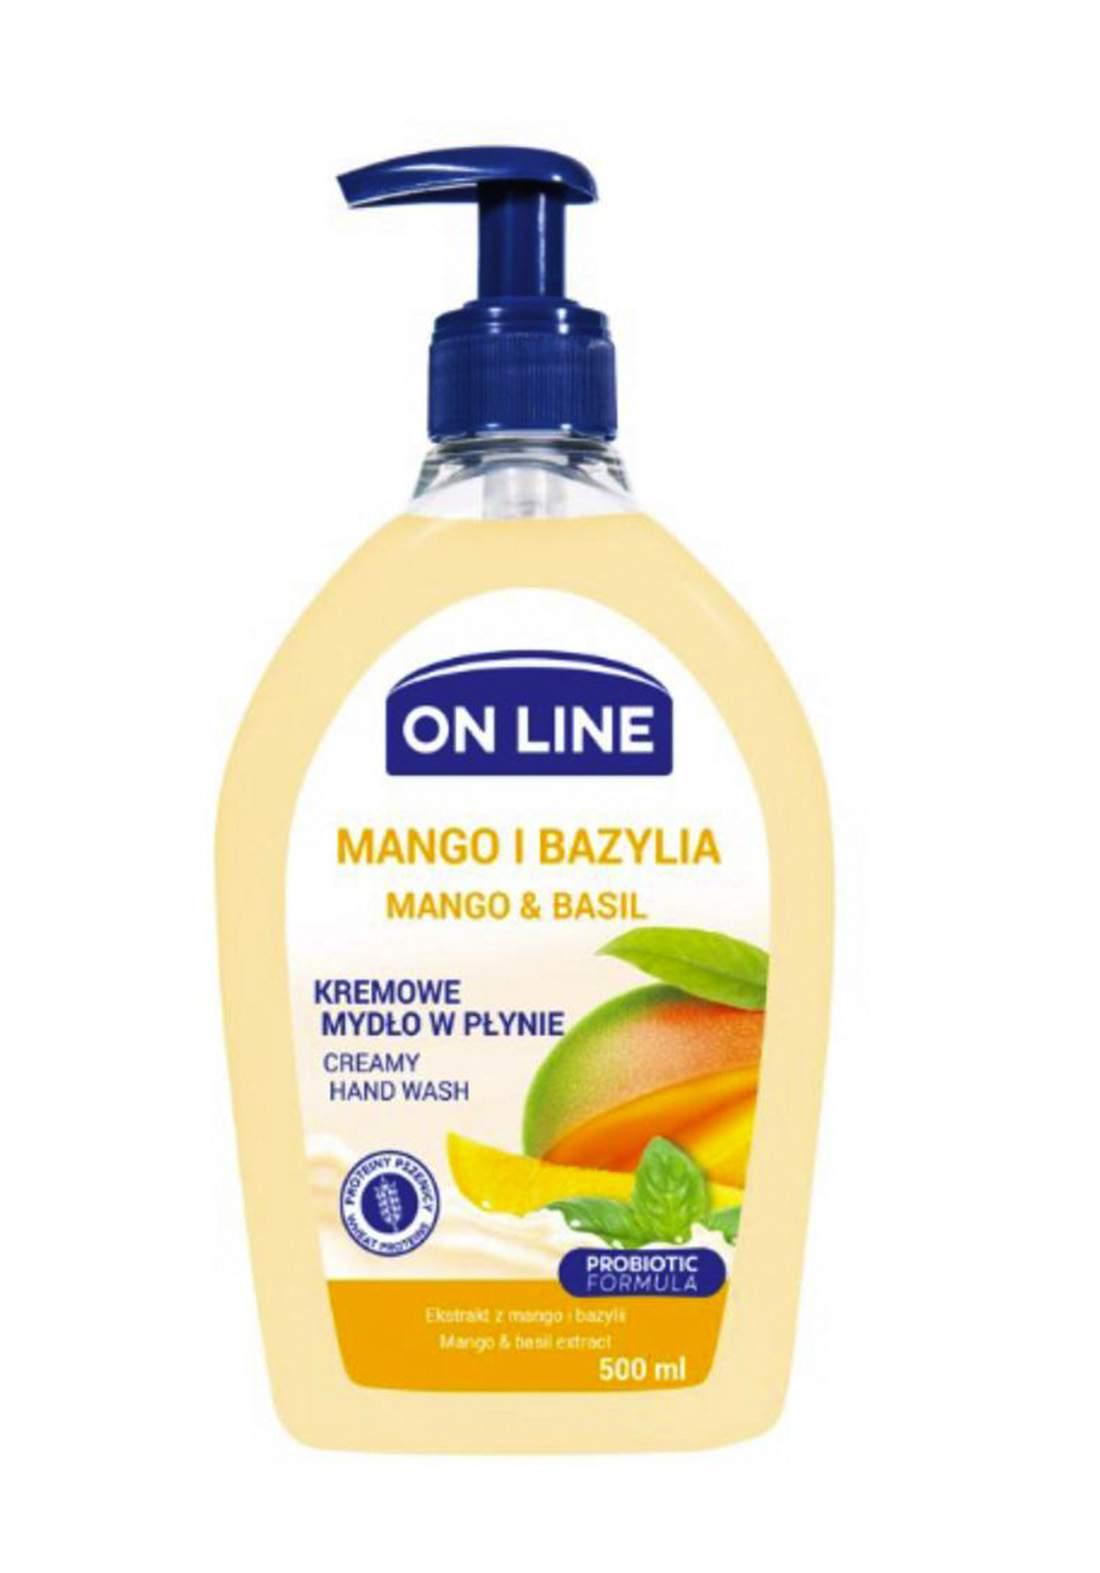 Online Mango&basil Hand wash 500 ml  صابون سائل لليدين